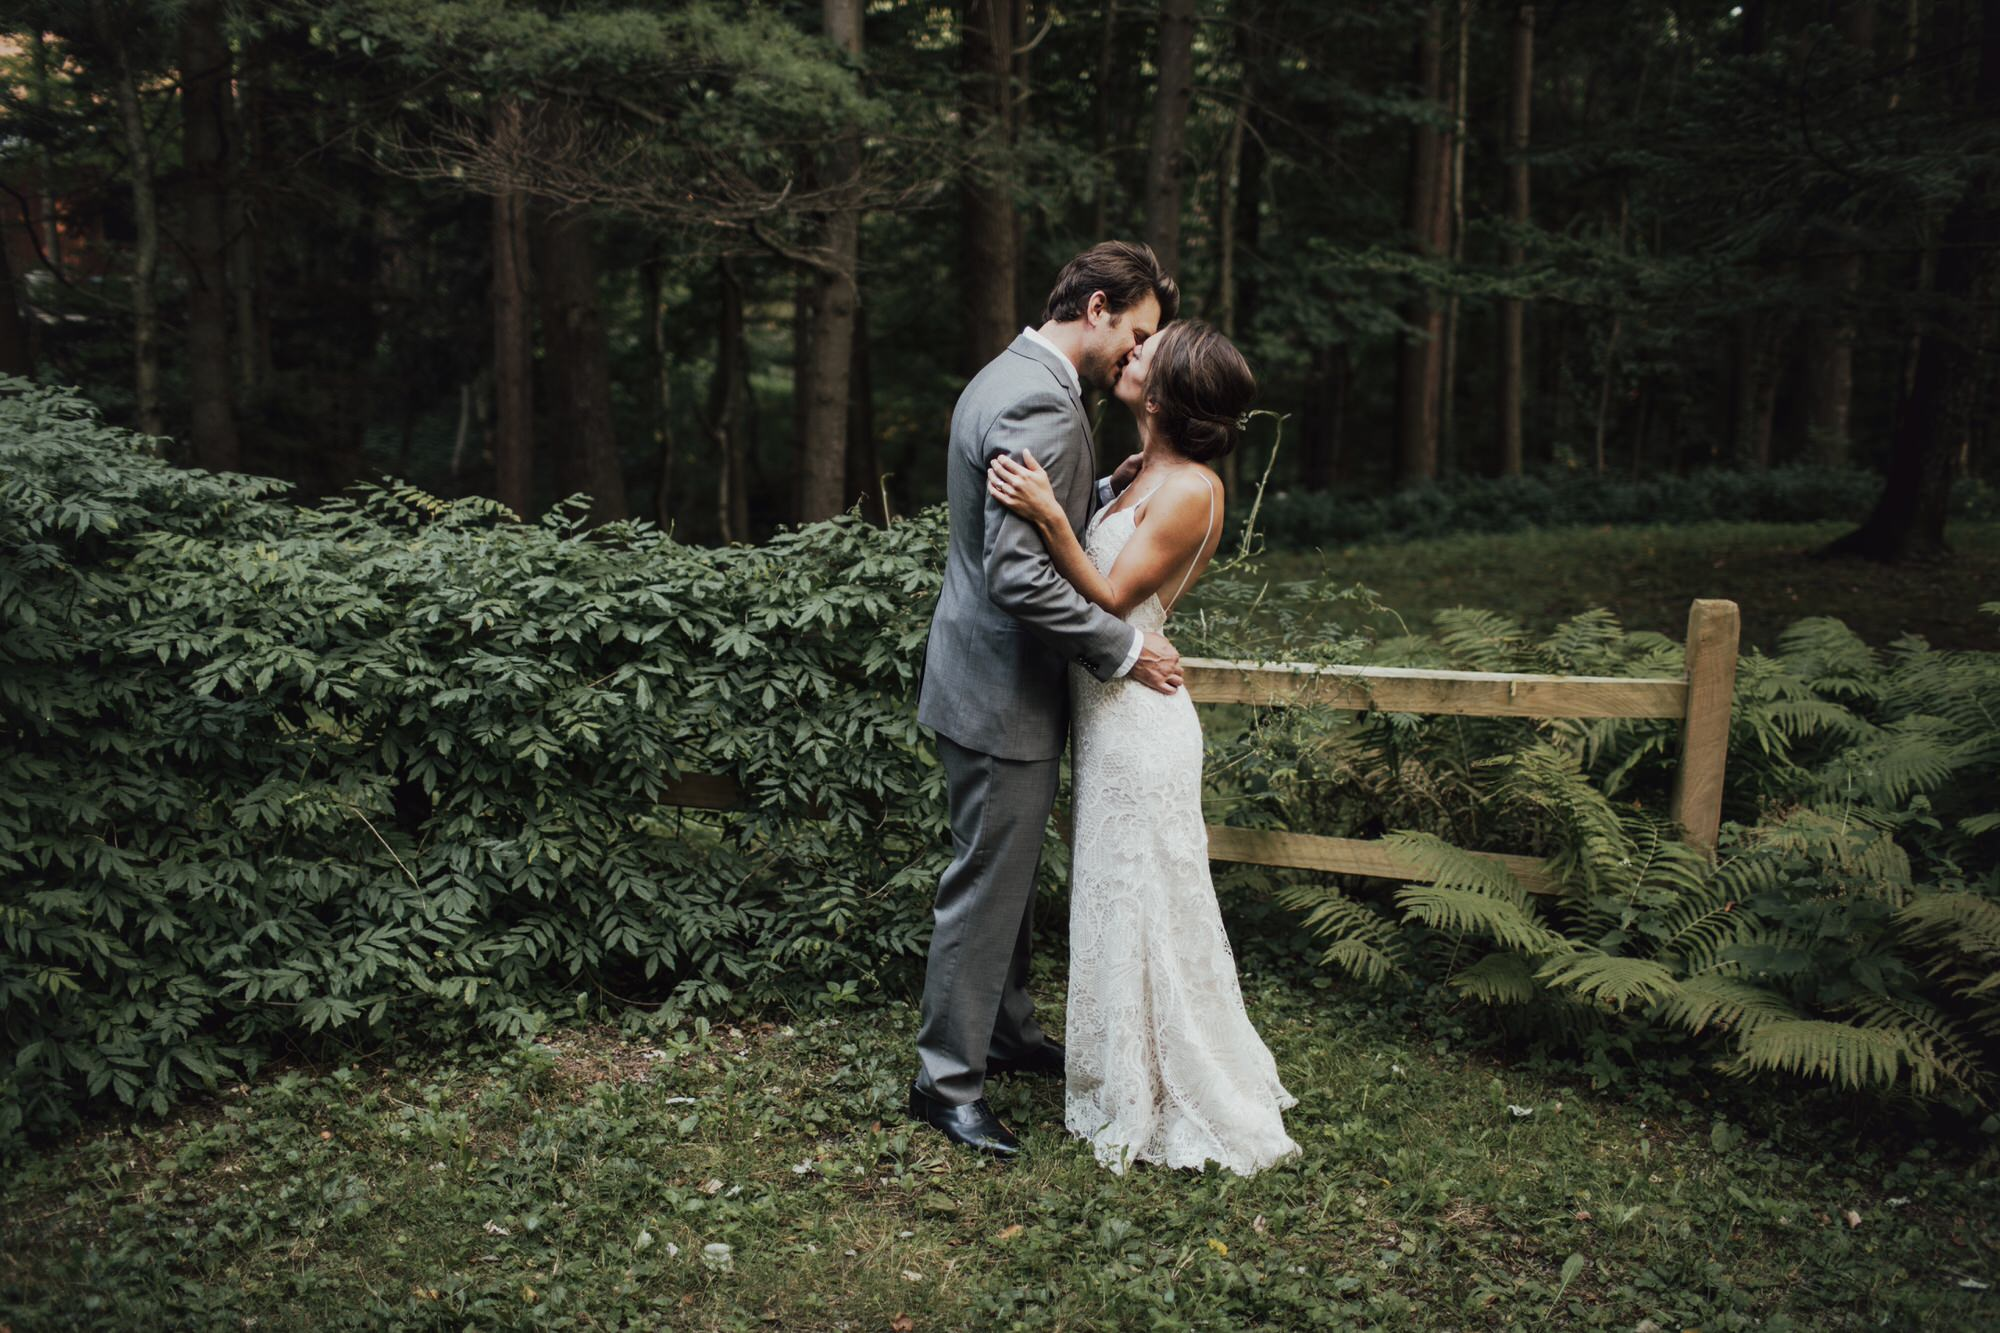 emily-aaron-rochester-new-york-wedding-photographer-104.JPG